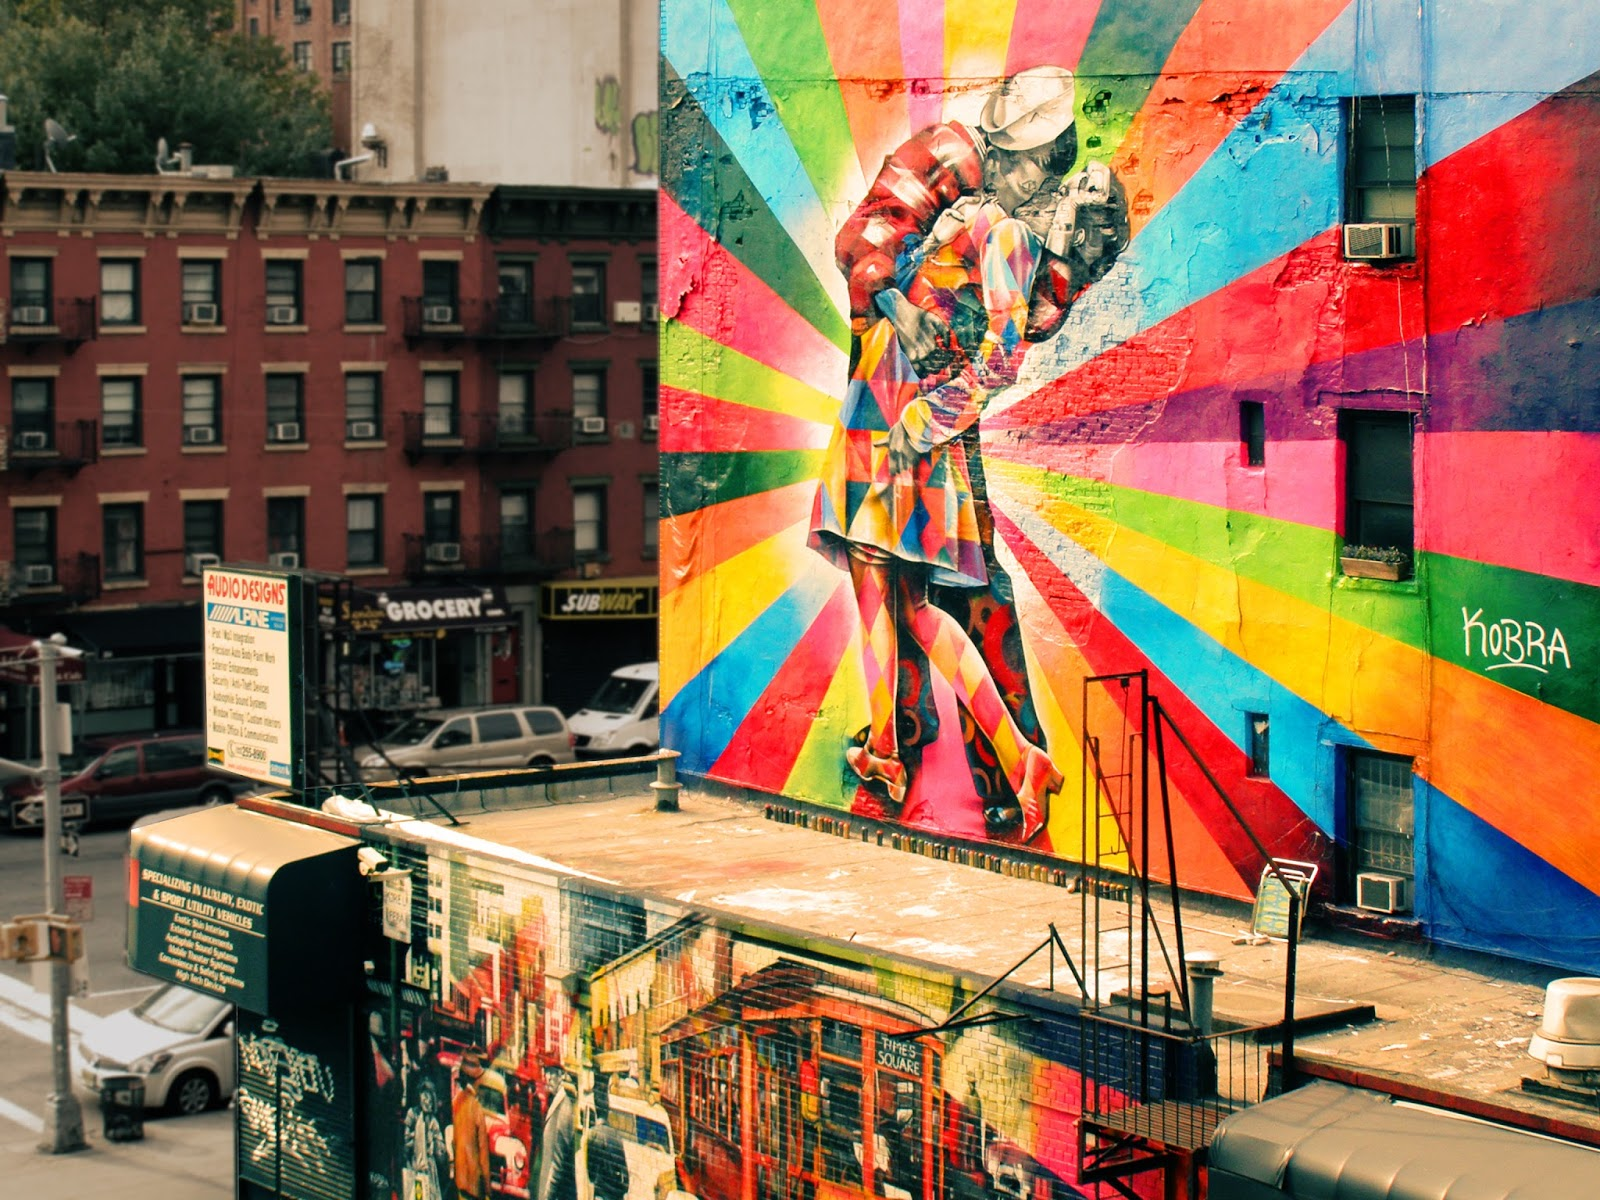 Urban mural of a sailor kissing a girl